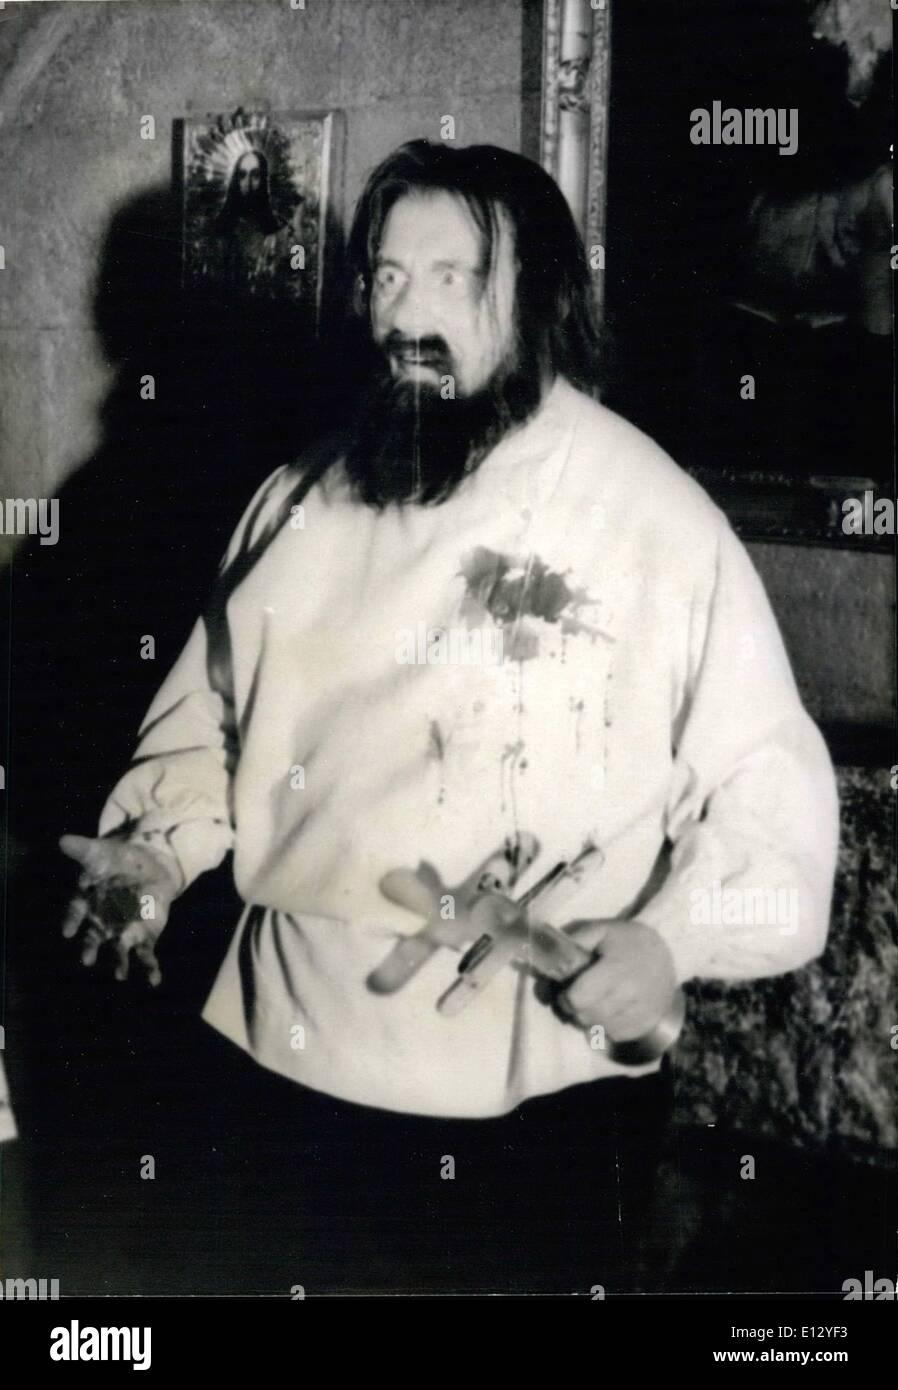 Feb. 26, 2012 - Rasputin Played by Gert Froebe - Stock Image